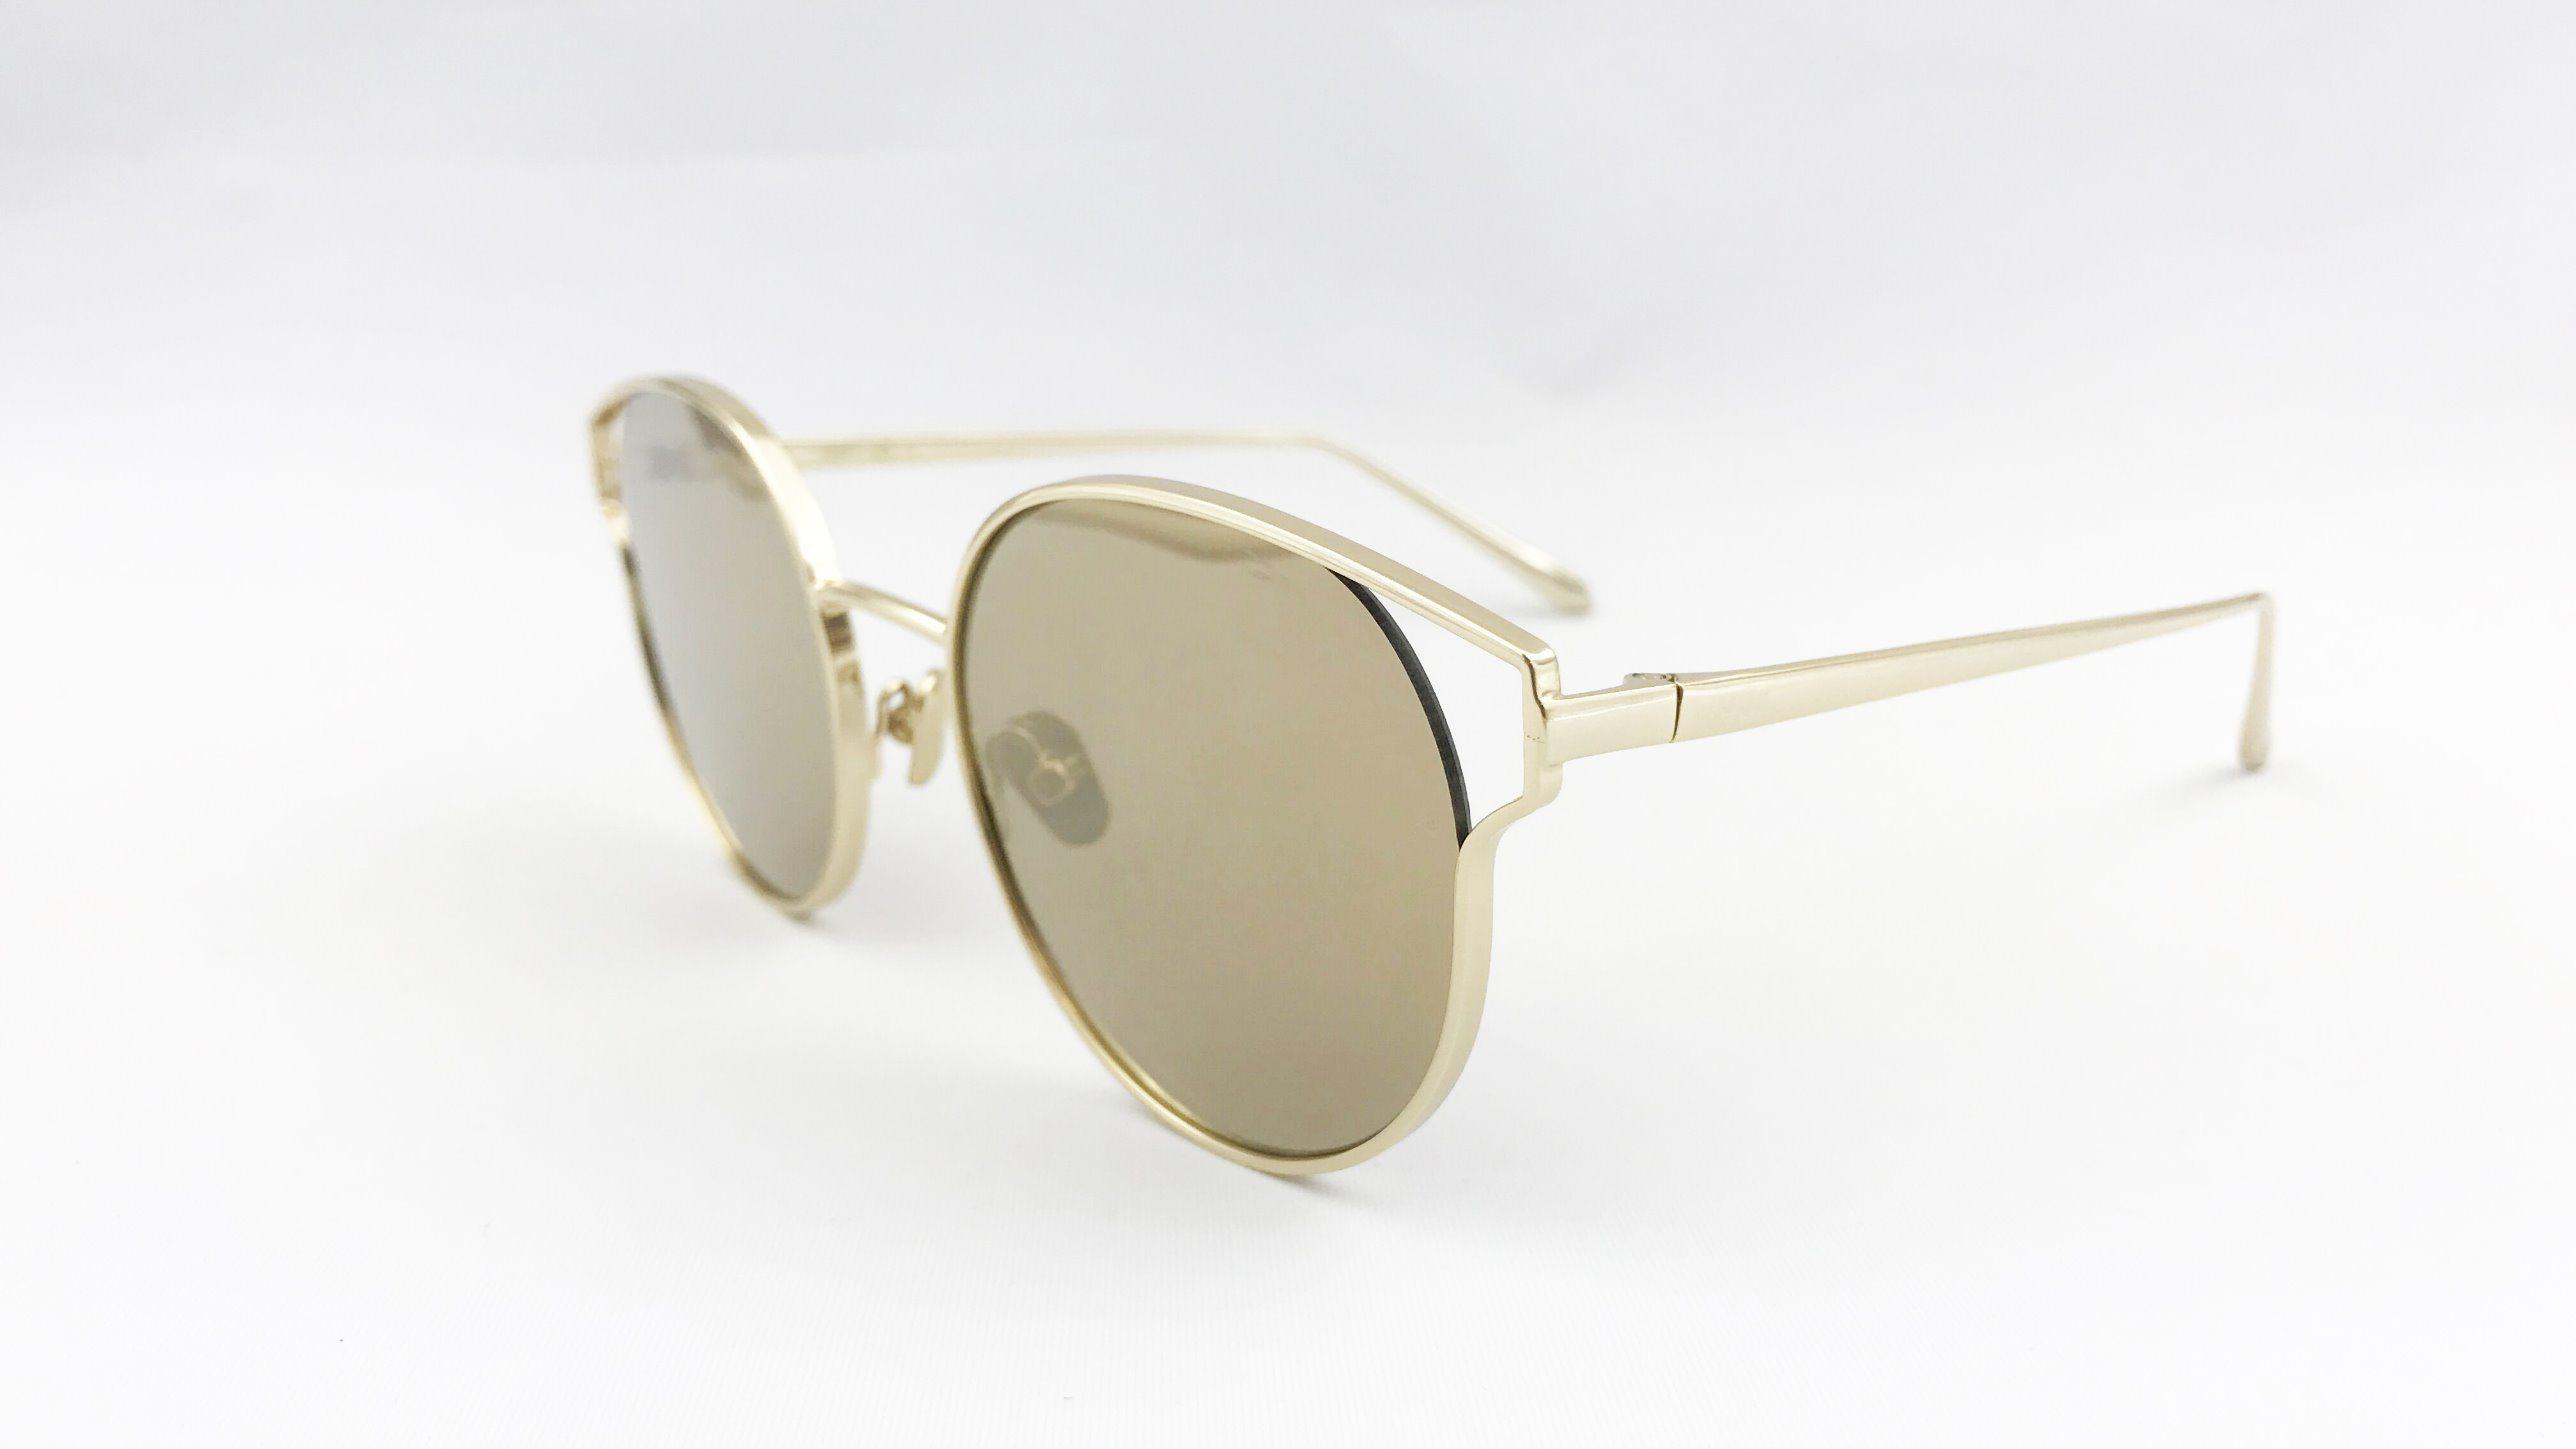 2016 Super Fashion Metal Sunglasses for Unisex. Eh1603